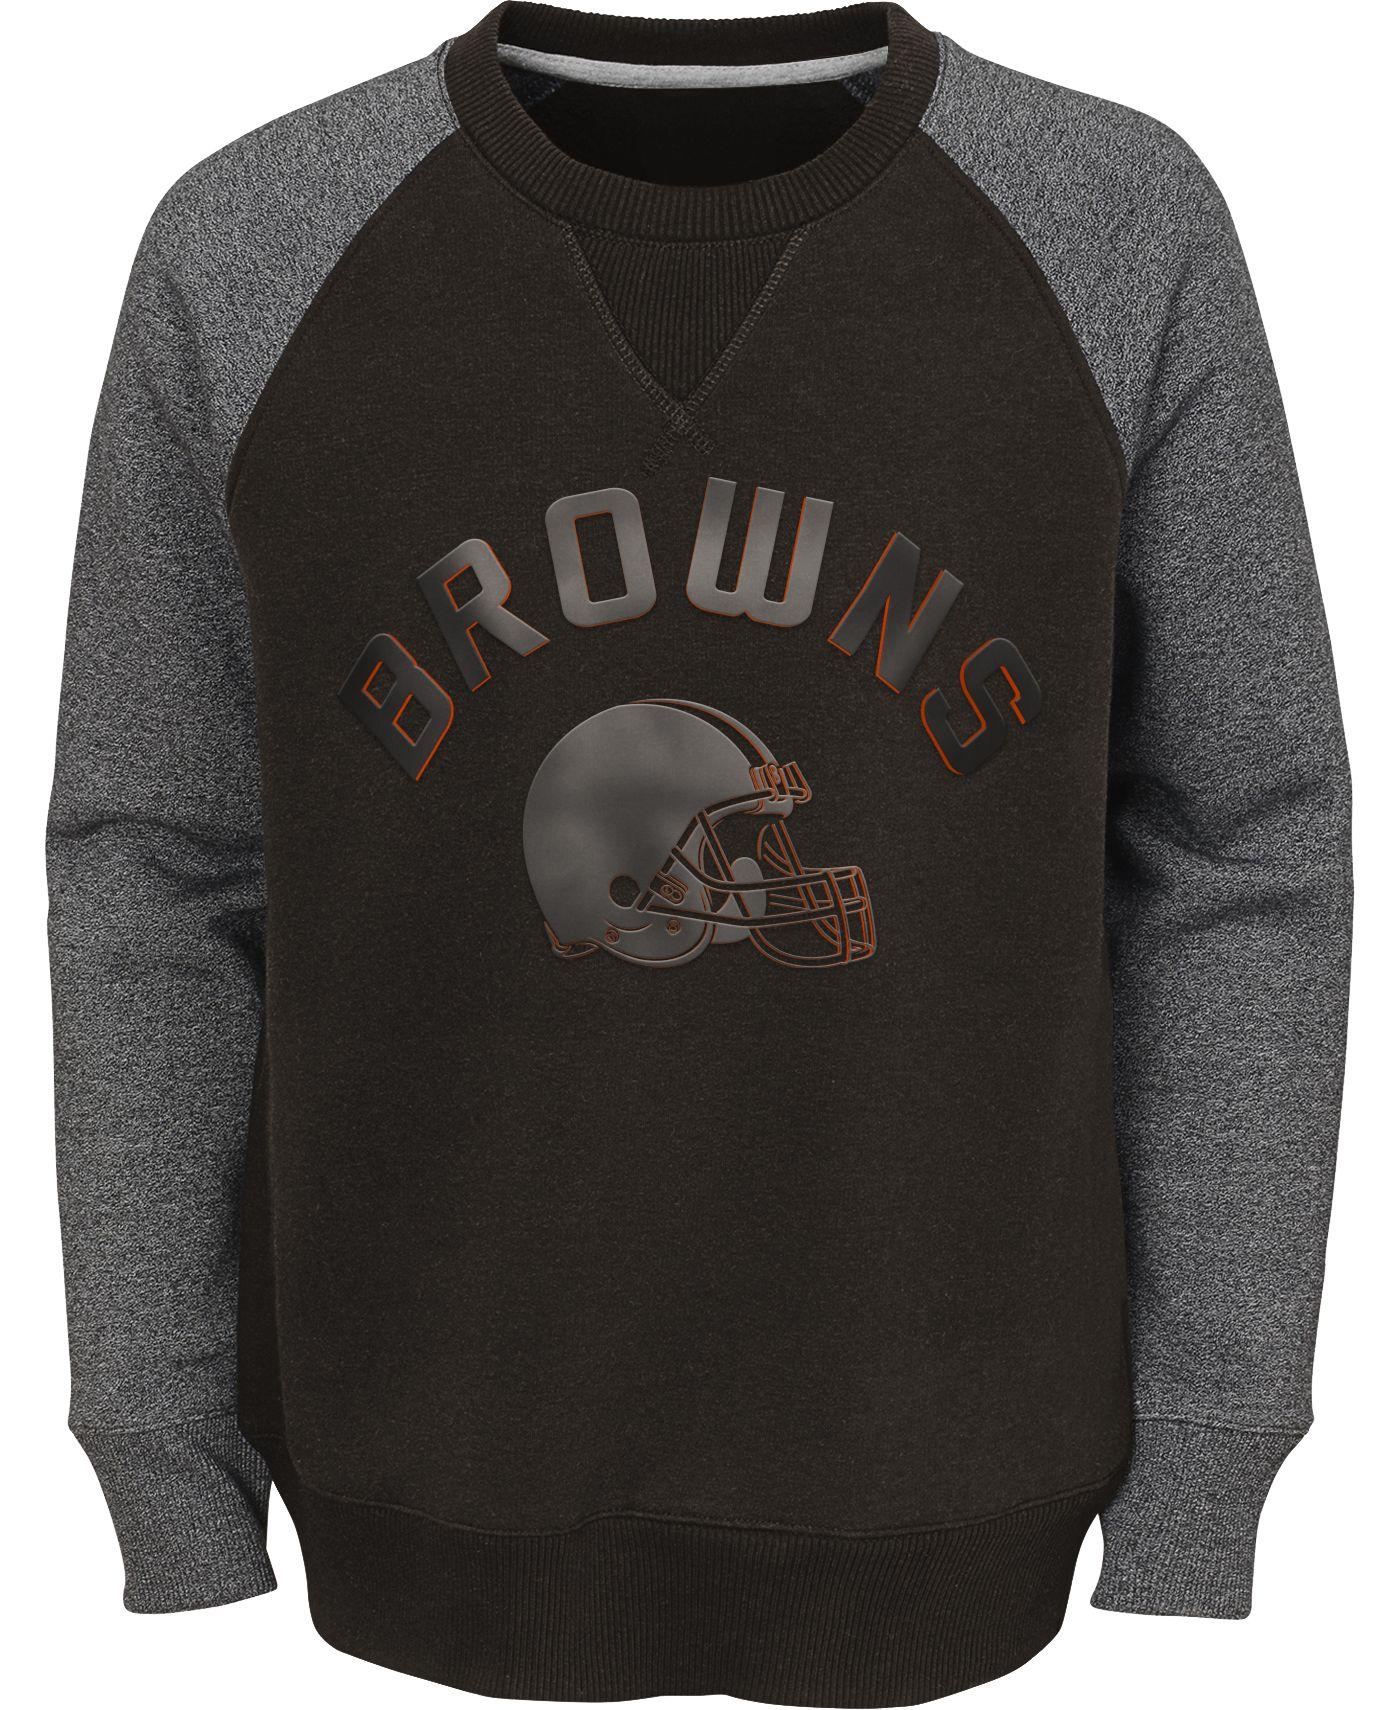 NFL Team Apparel Youth Cleveland Browns Raglan Fleece Gray Crew